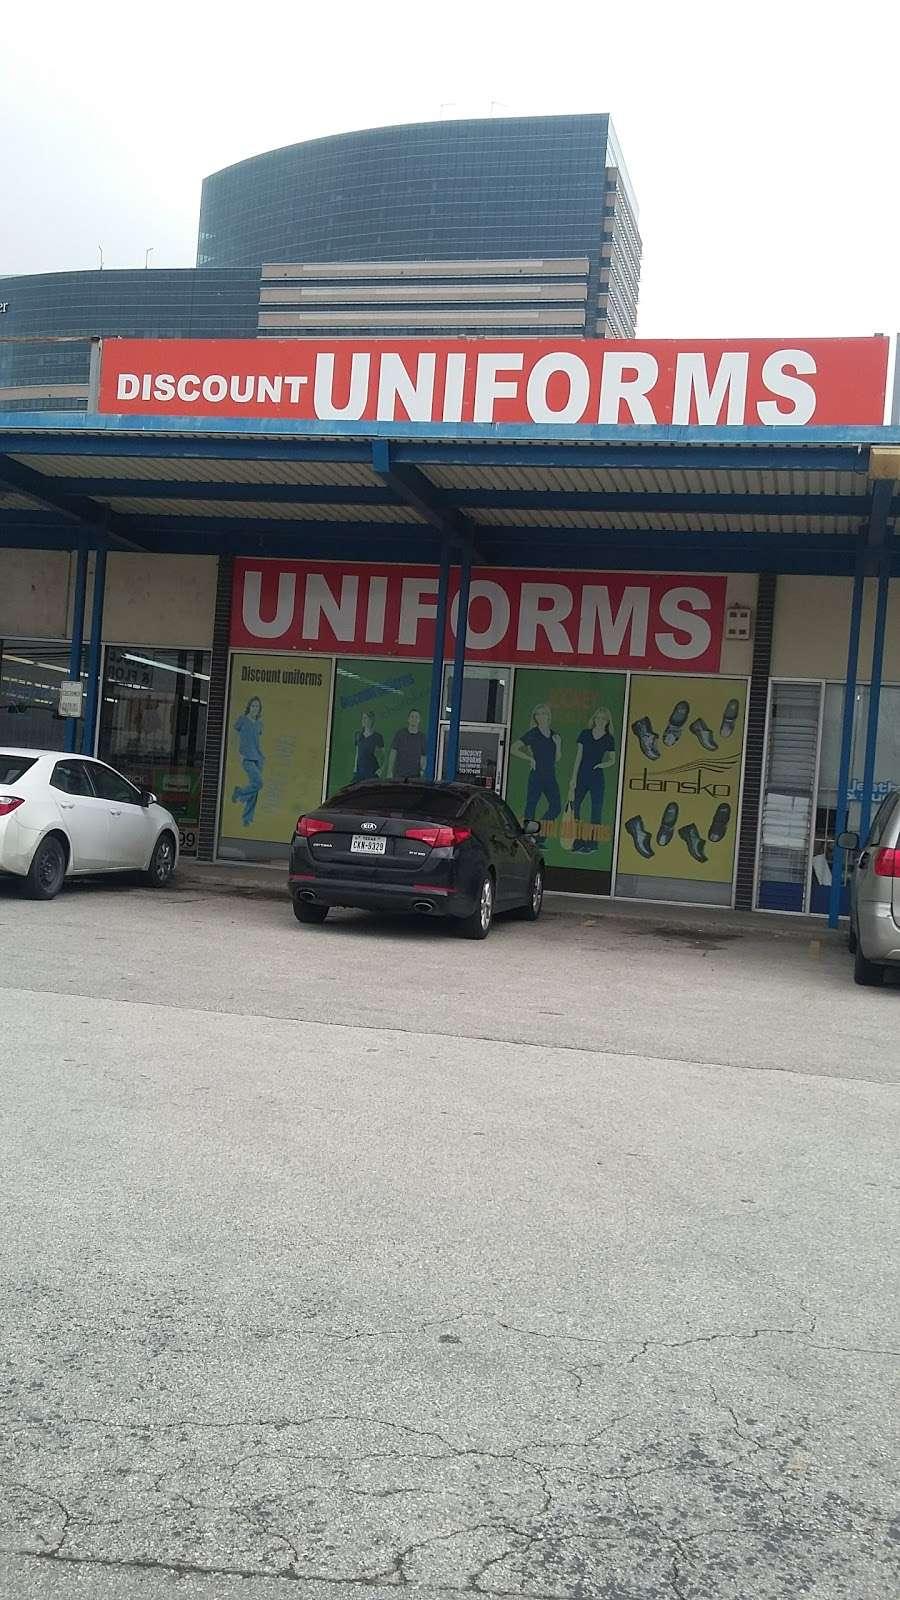 Discount Uniform Corporation - clothing store  | Photo 3 of 3 | Address: 7131 Fannin St, Houston, TX 77030, USA | Phone: (713) 797-9400